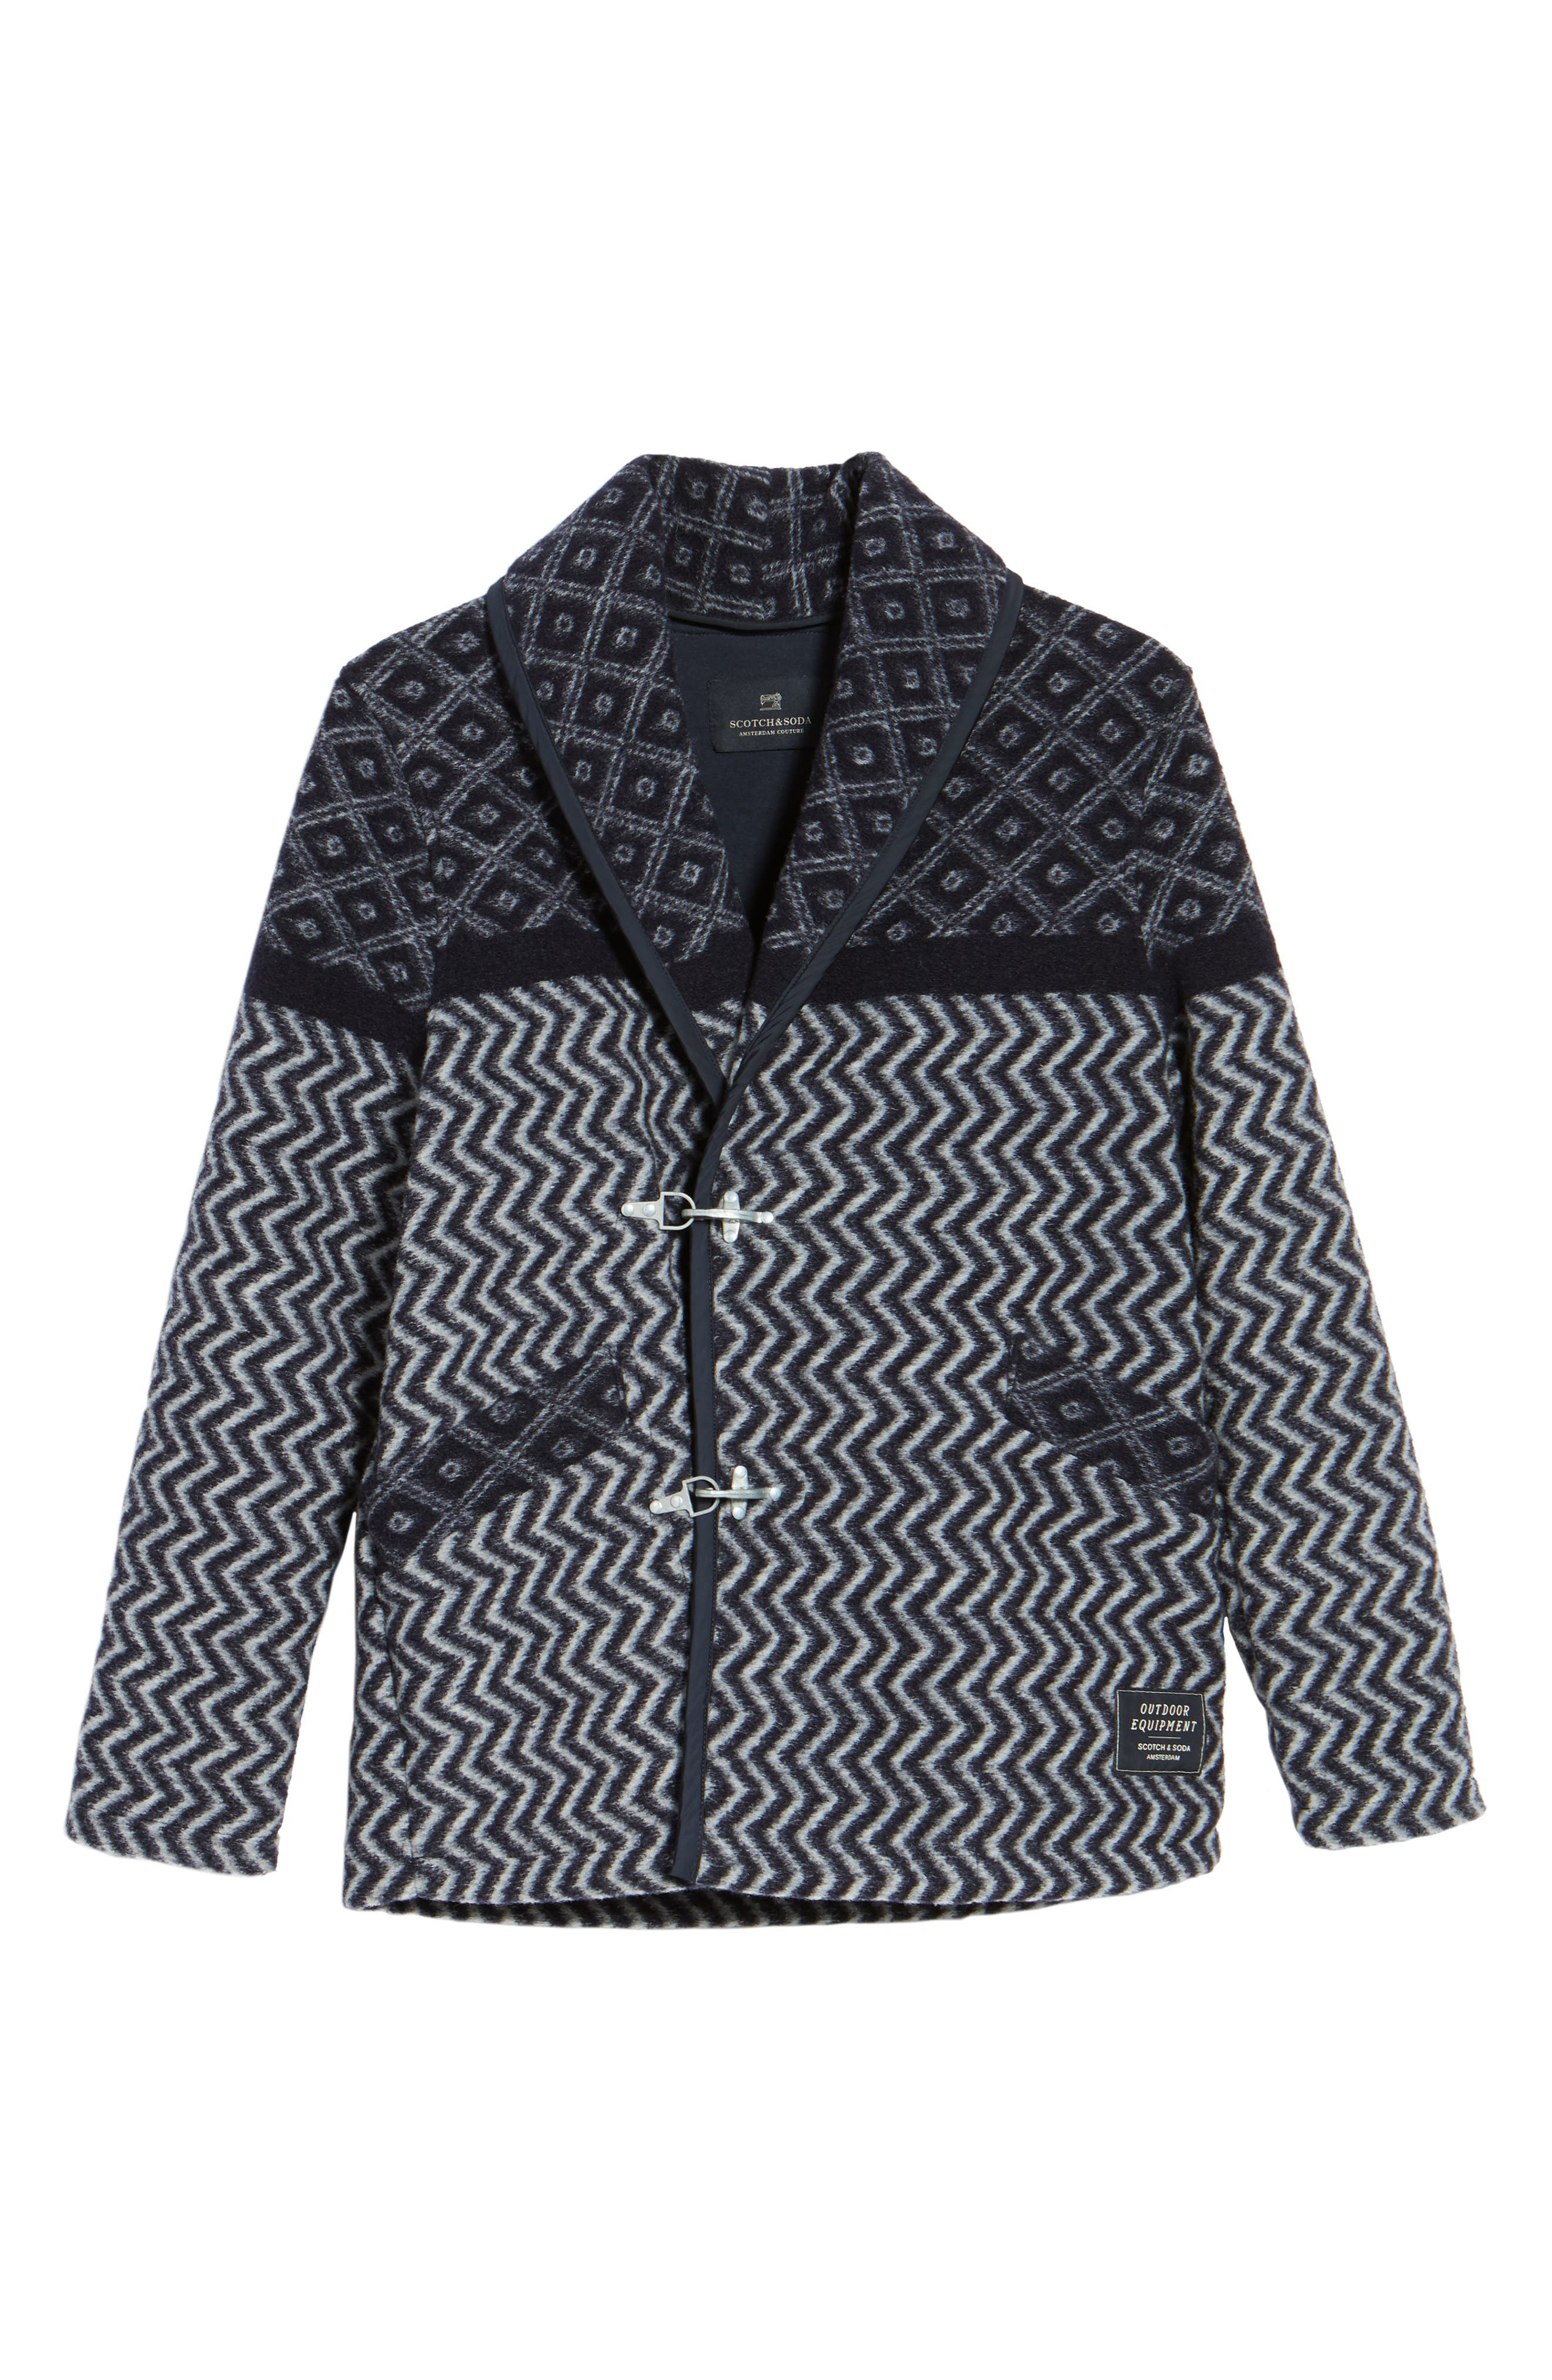 Blanket Jacket,                             Alternate thumbnail 6, color,                             Blue